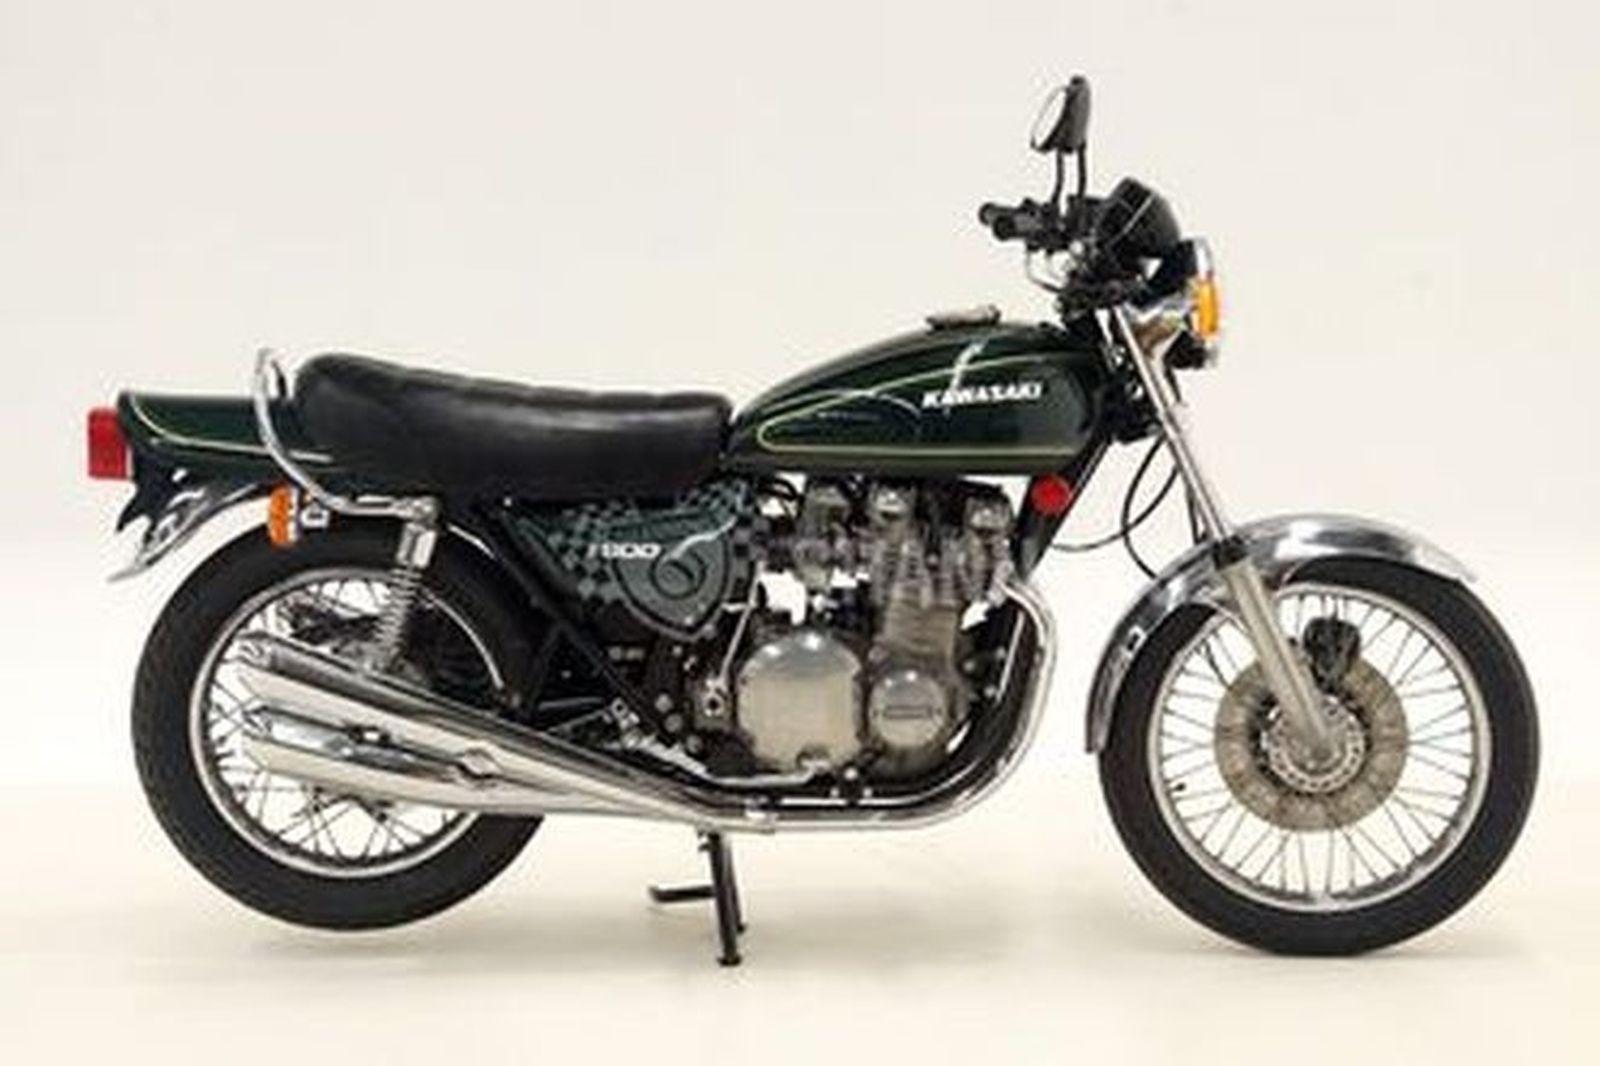 Kawazaki Z900 Motorcycle